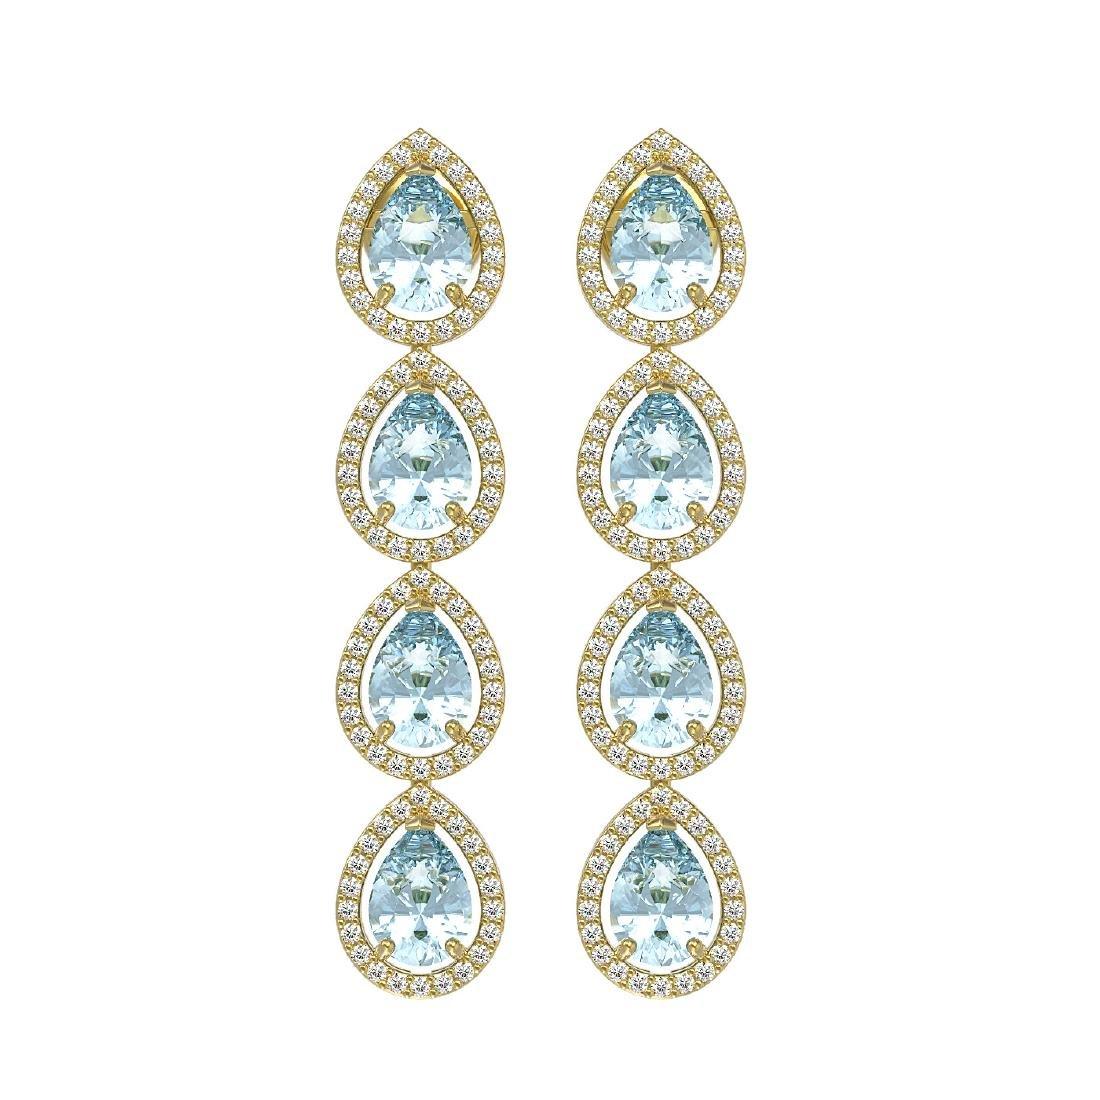 7.41 CTW Aquamarine & Diamond Halo Earrings 10K Yellow